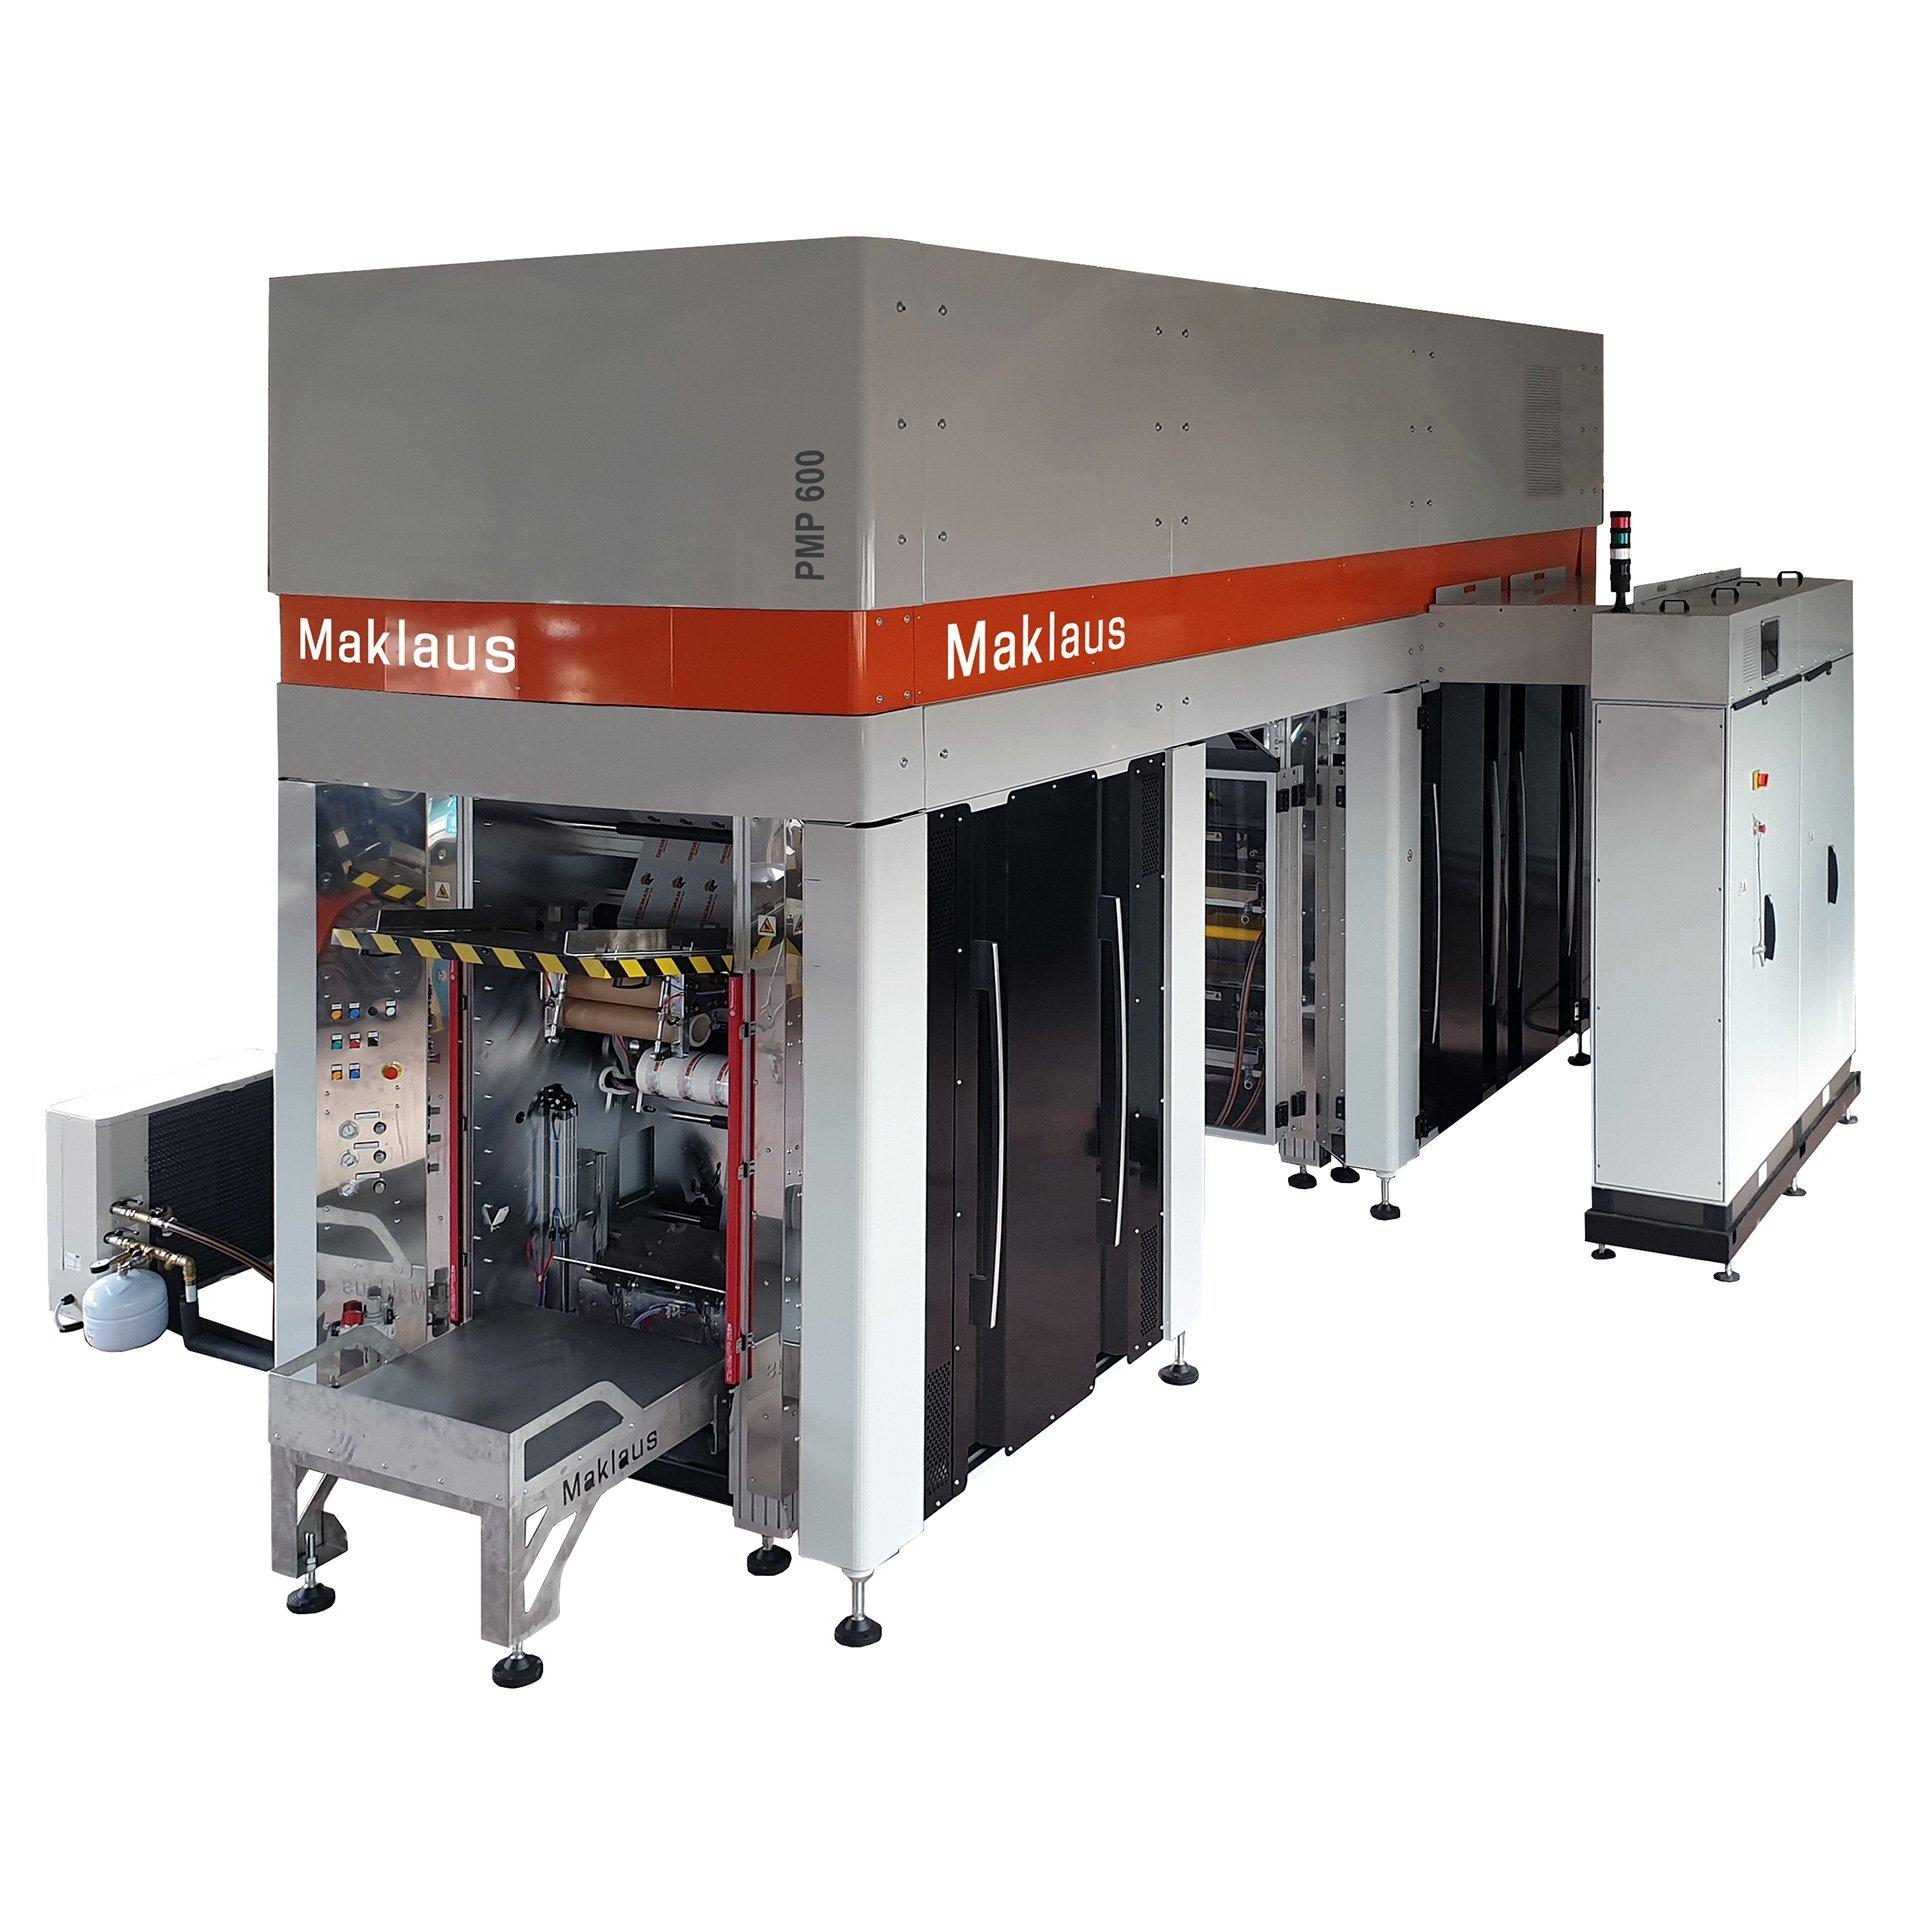 Pmp600 Printing Machine Q